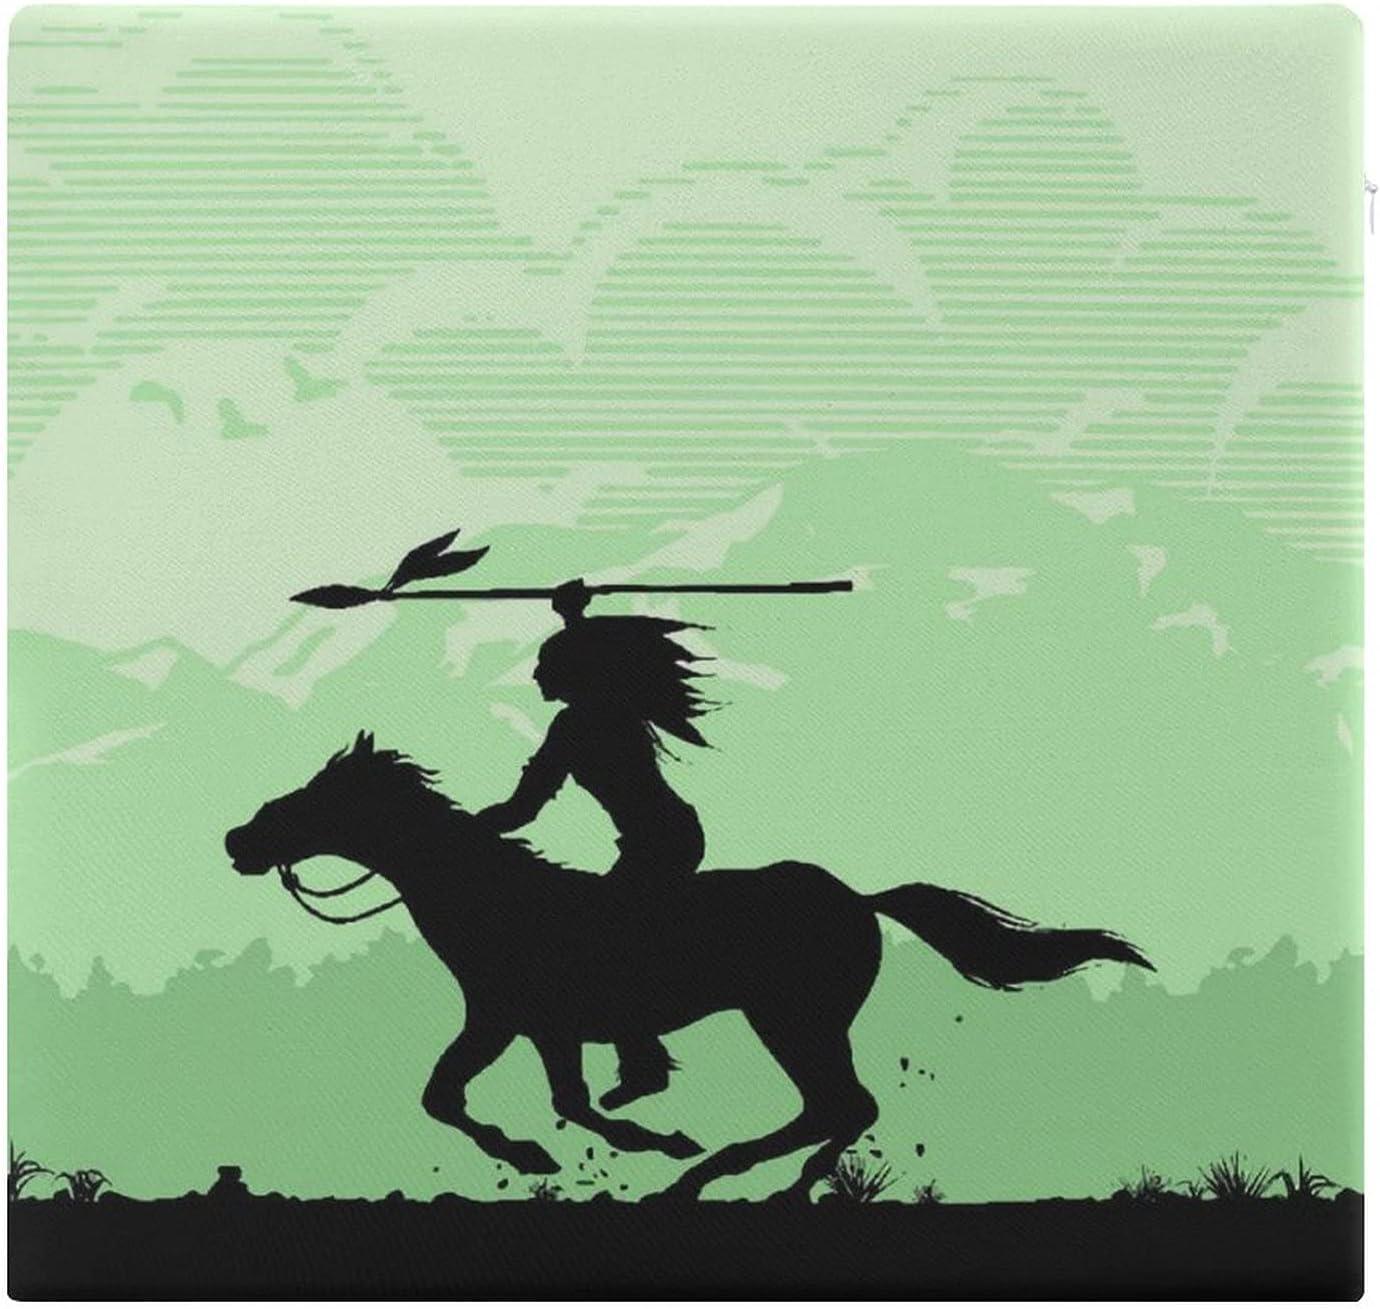 Cojines de Suelo Cuadrados,Cojín de Asiento de cojín de Silla,América Silueta de los Indios nativos Americanos a Caballo con Lanza,Sentado para Oficina,hogar,Suave Espesar